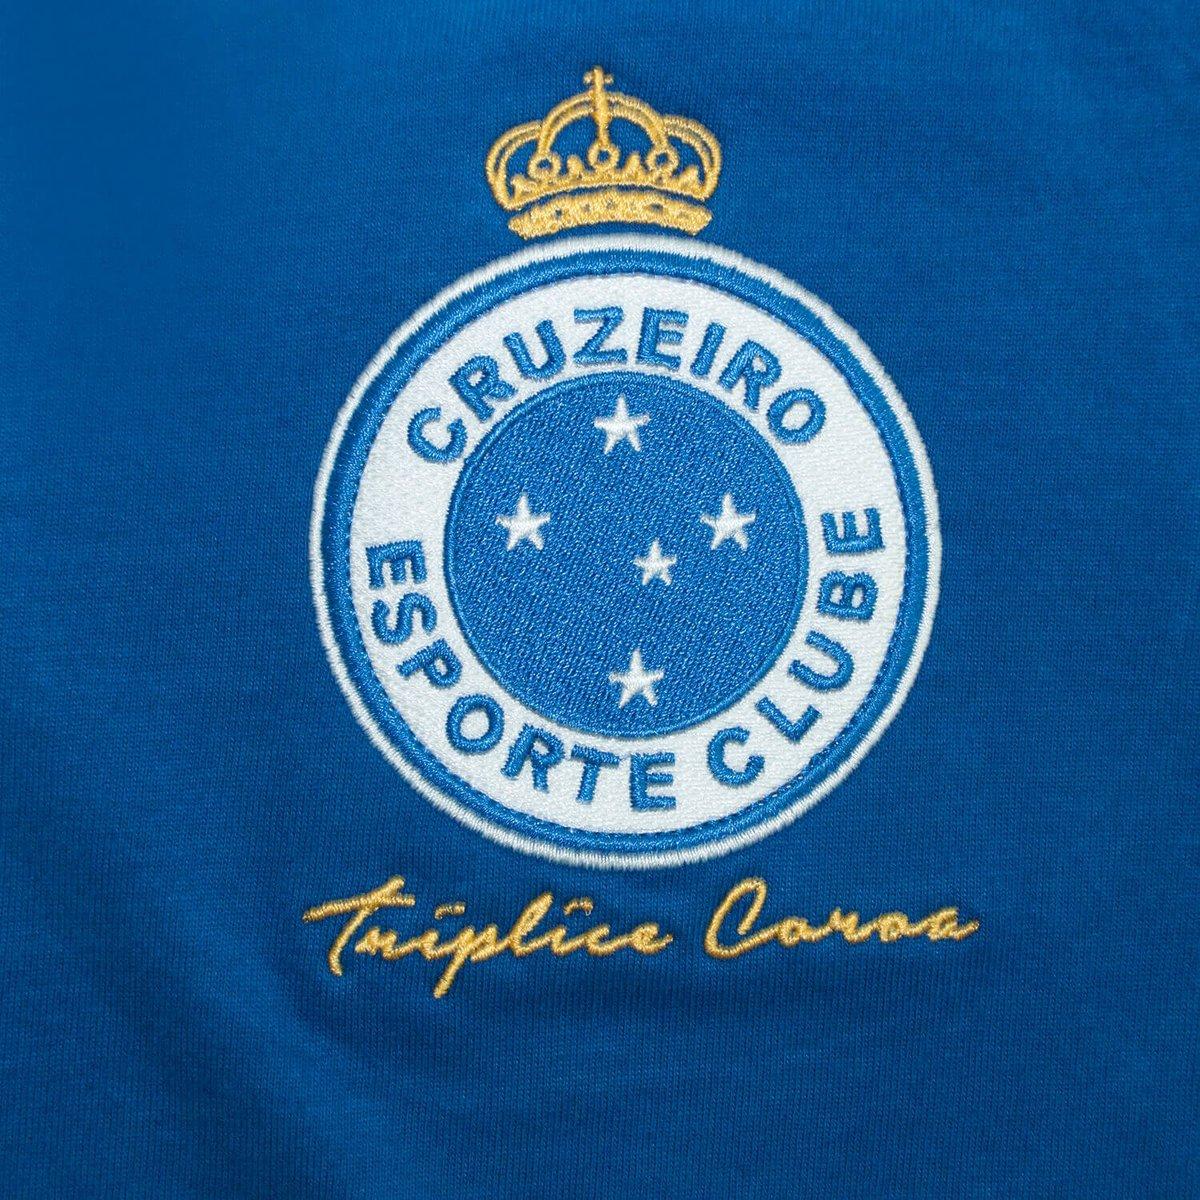 ... Camisa Retrô Mania Cruzeiro 2003 - Alex - Tríplice Coroa Masculina ... e863ea9b5f61c